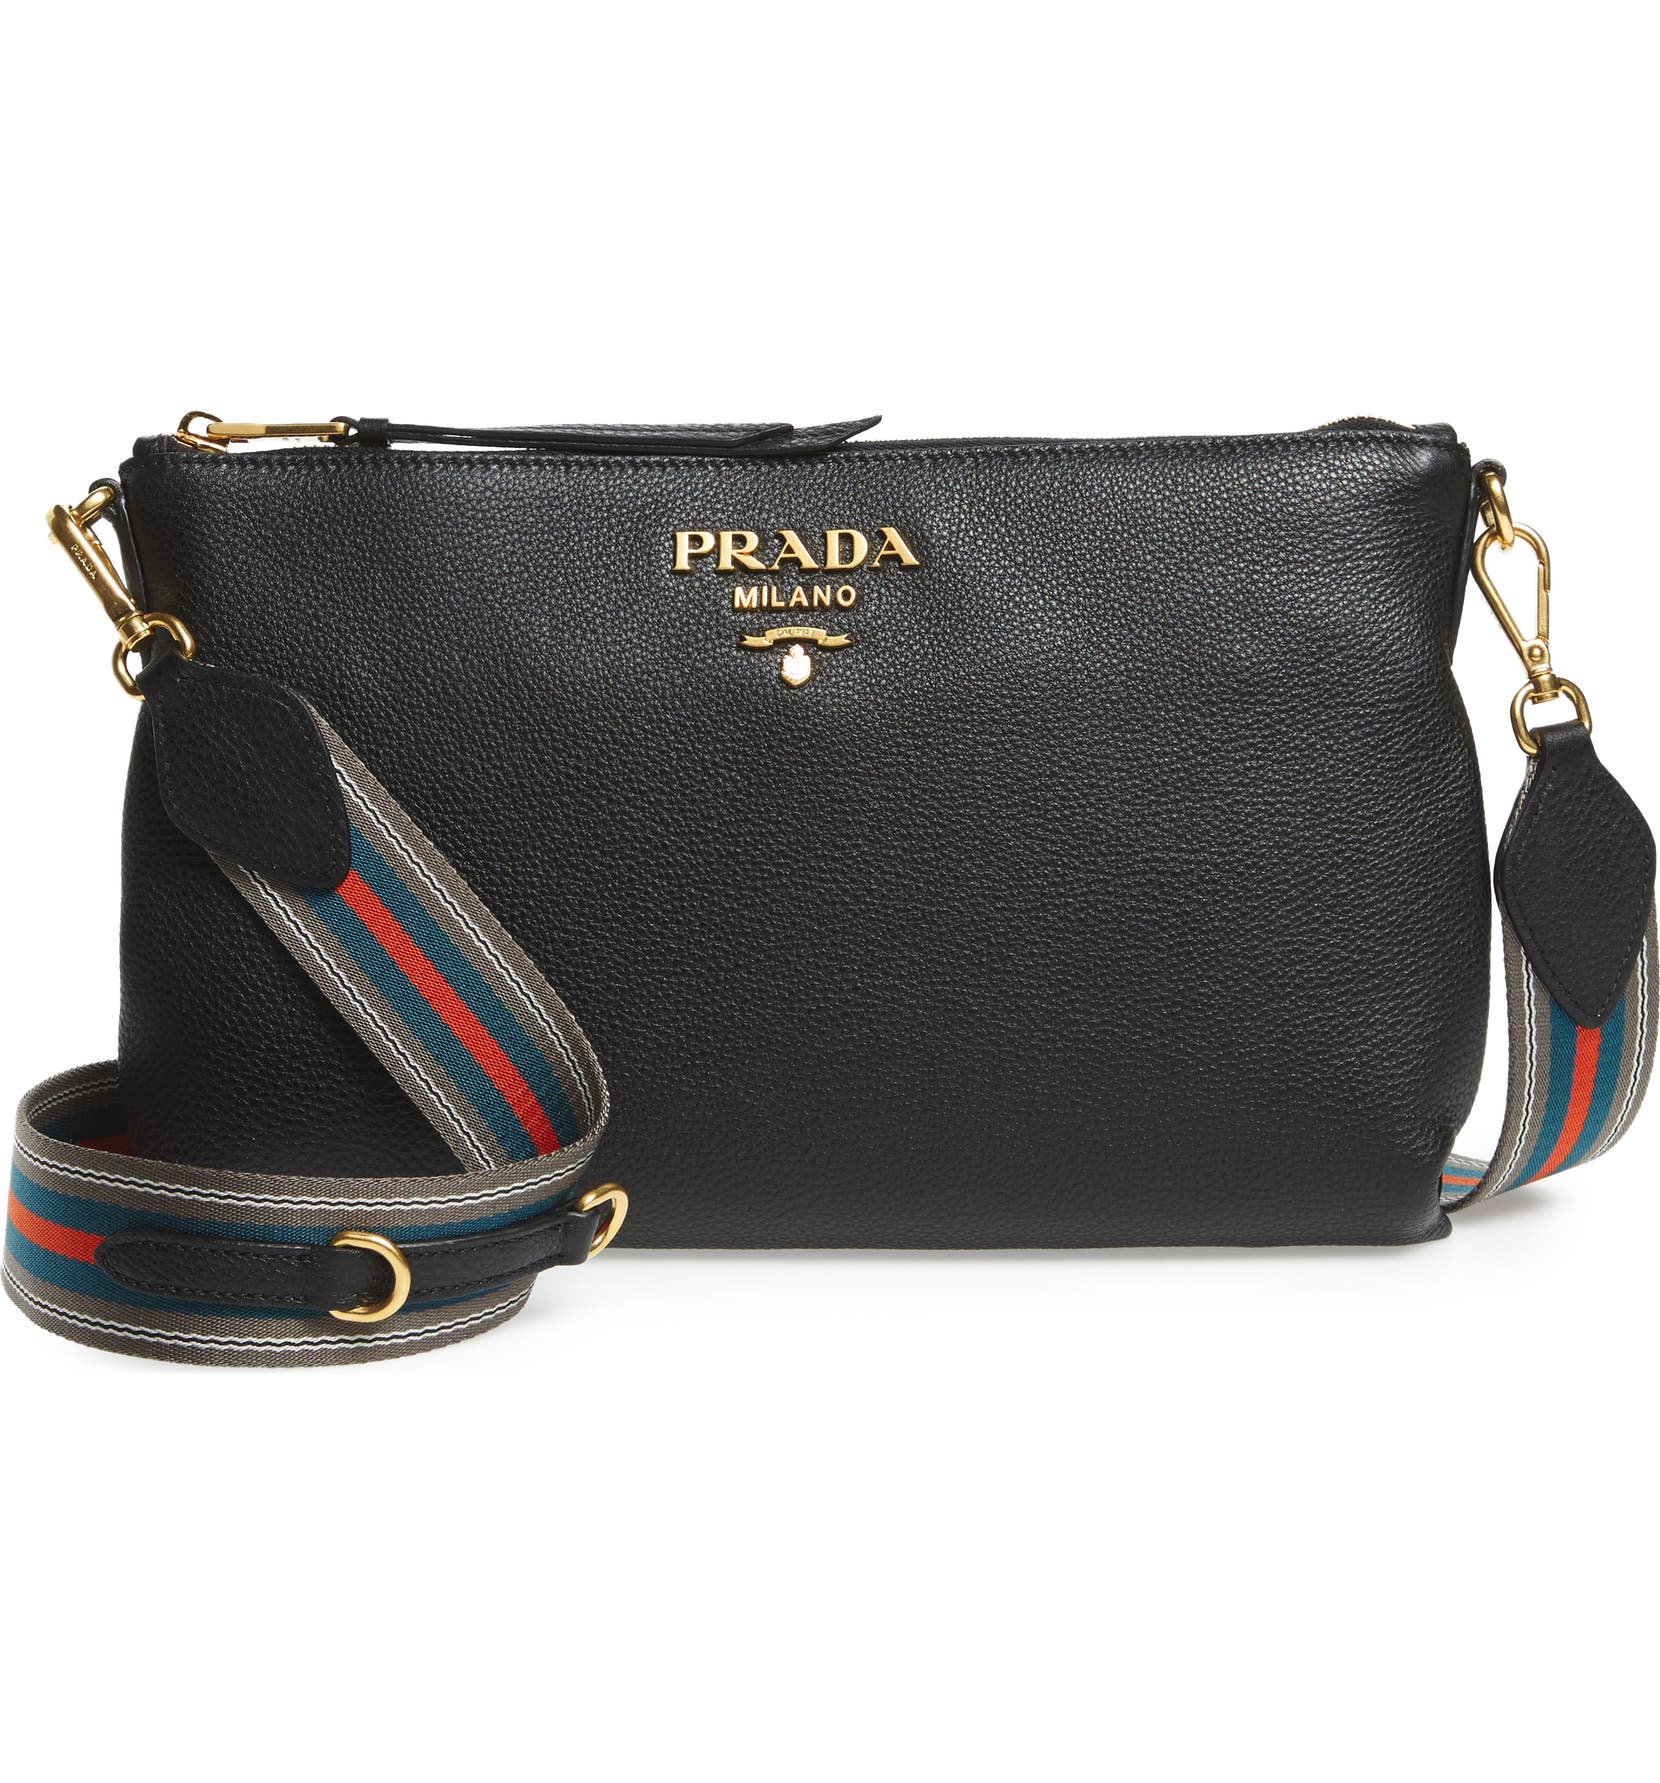 045468742b5 Prada Vitello Daino Leather Crossbody Bag   Nordstrom